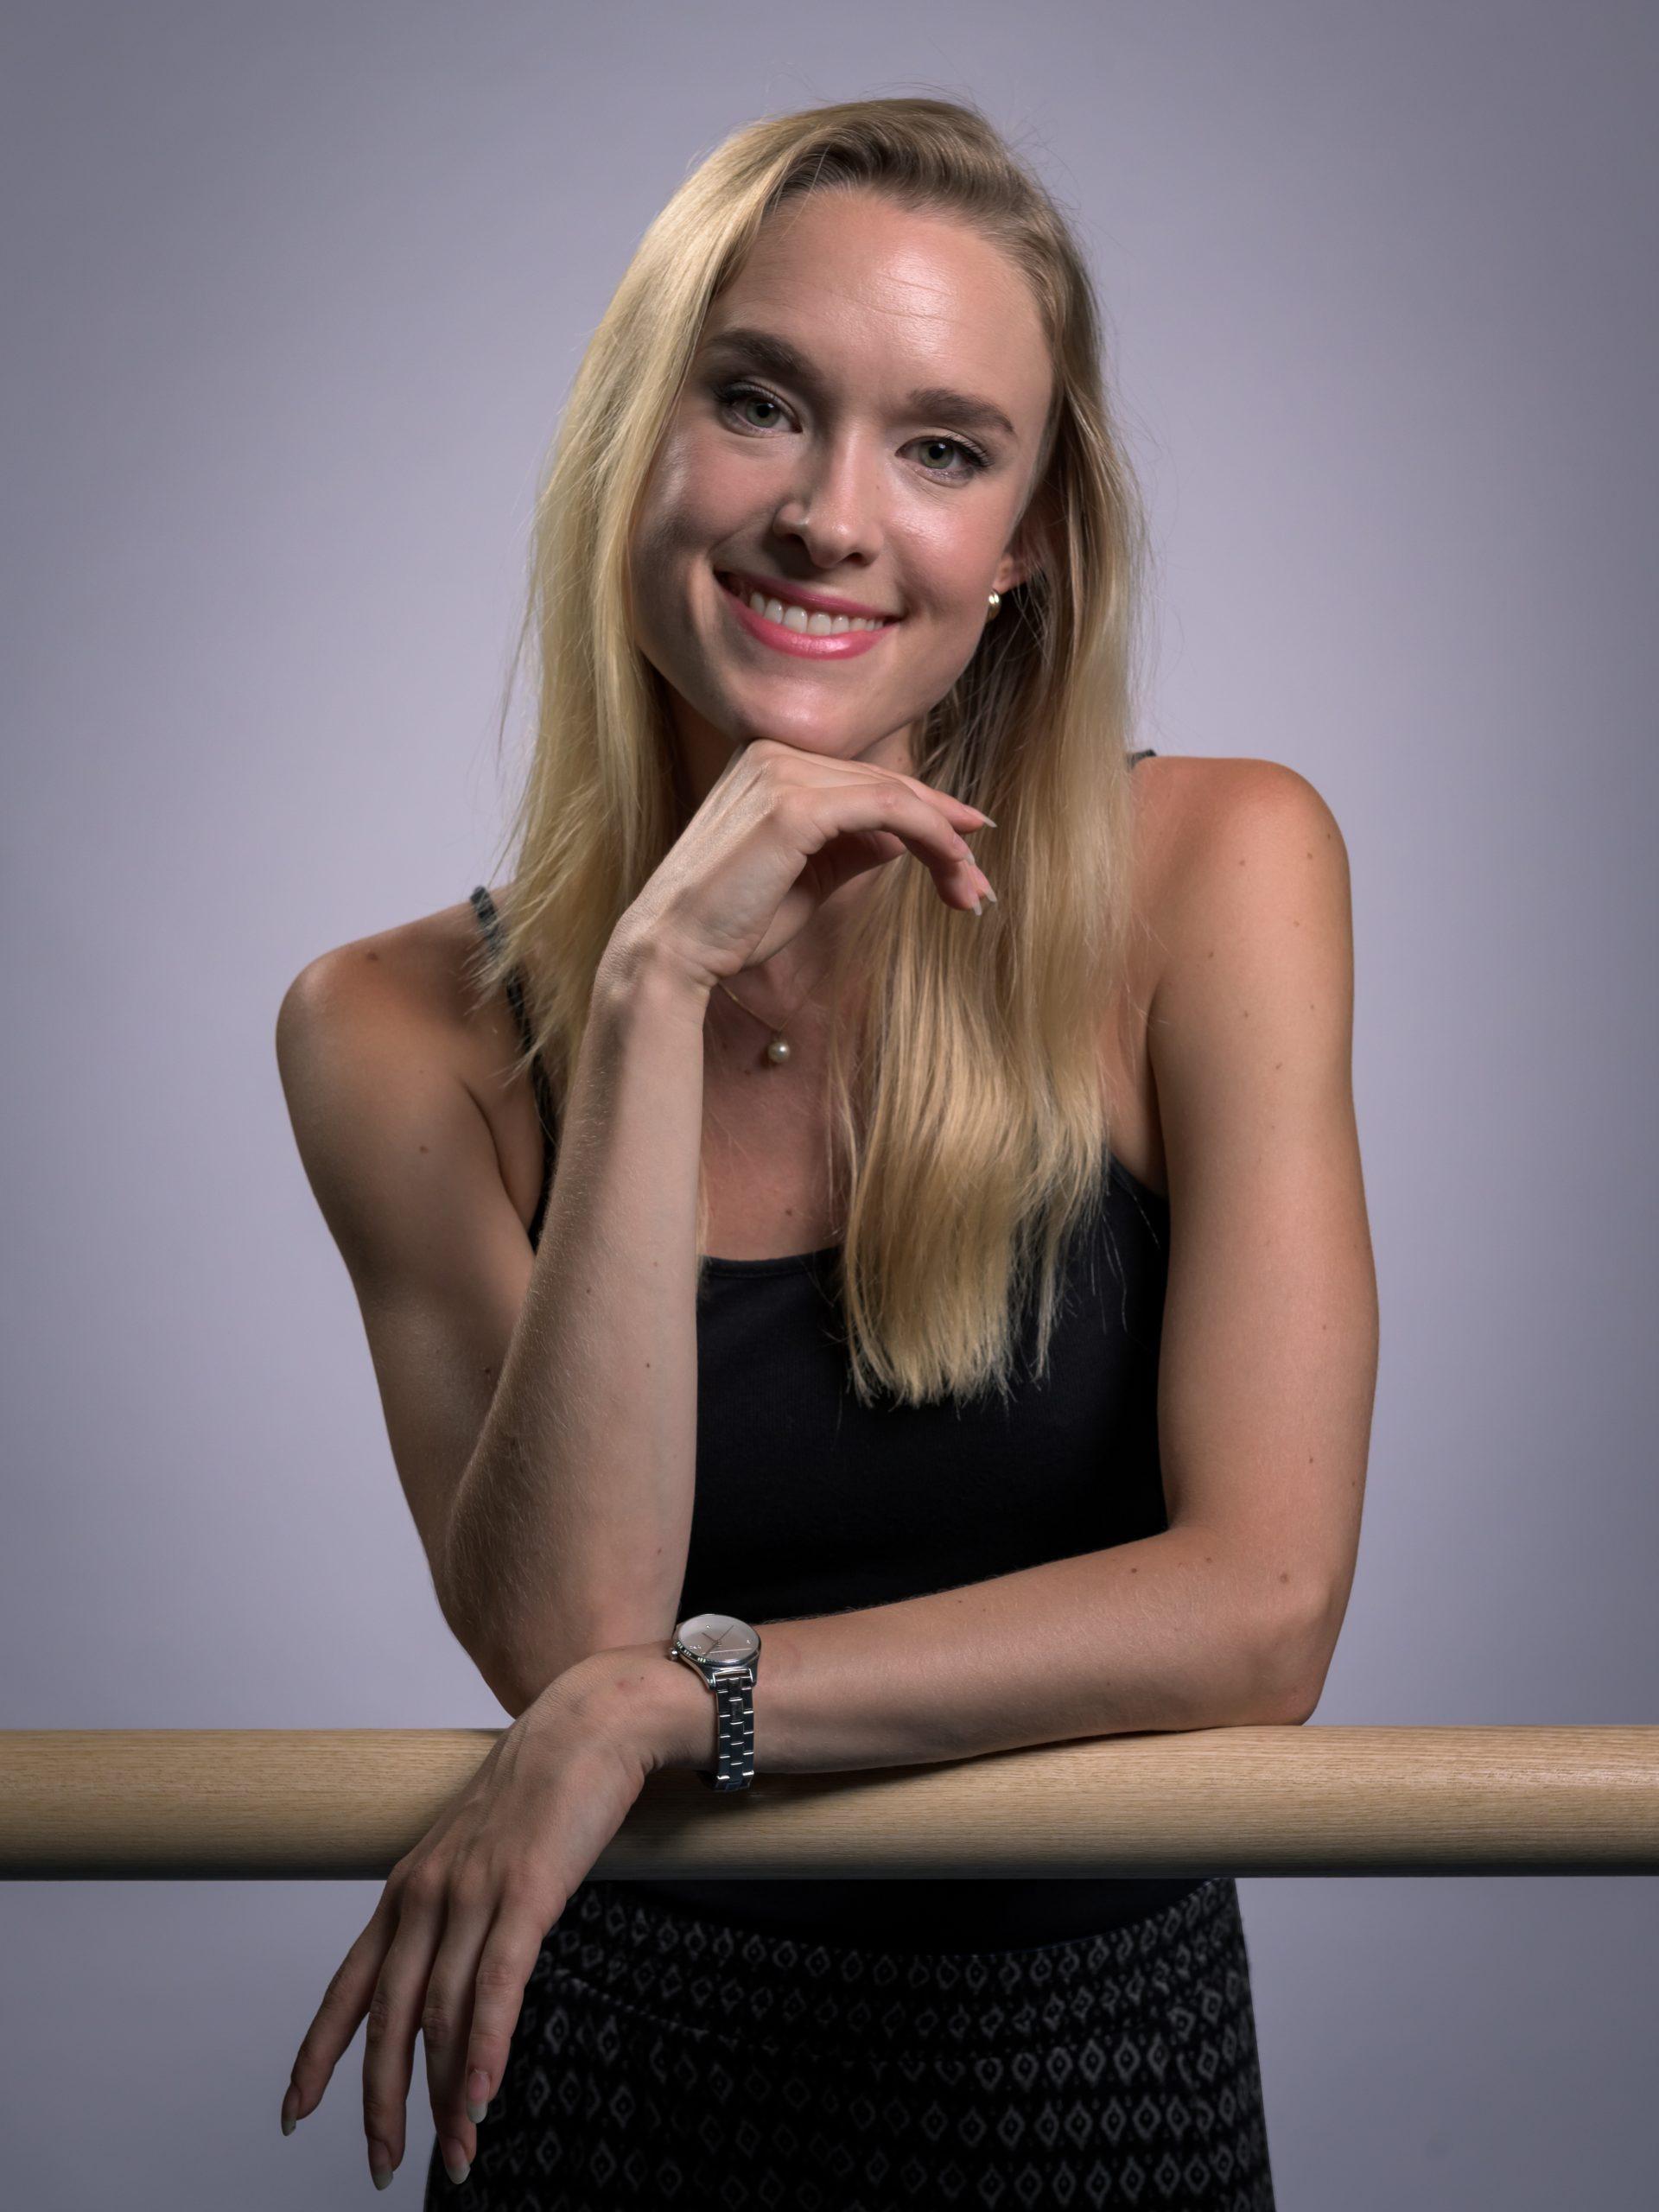 Emilia Vuorio